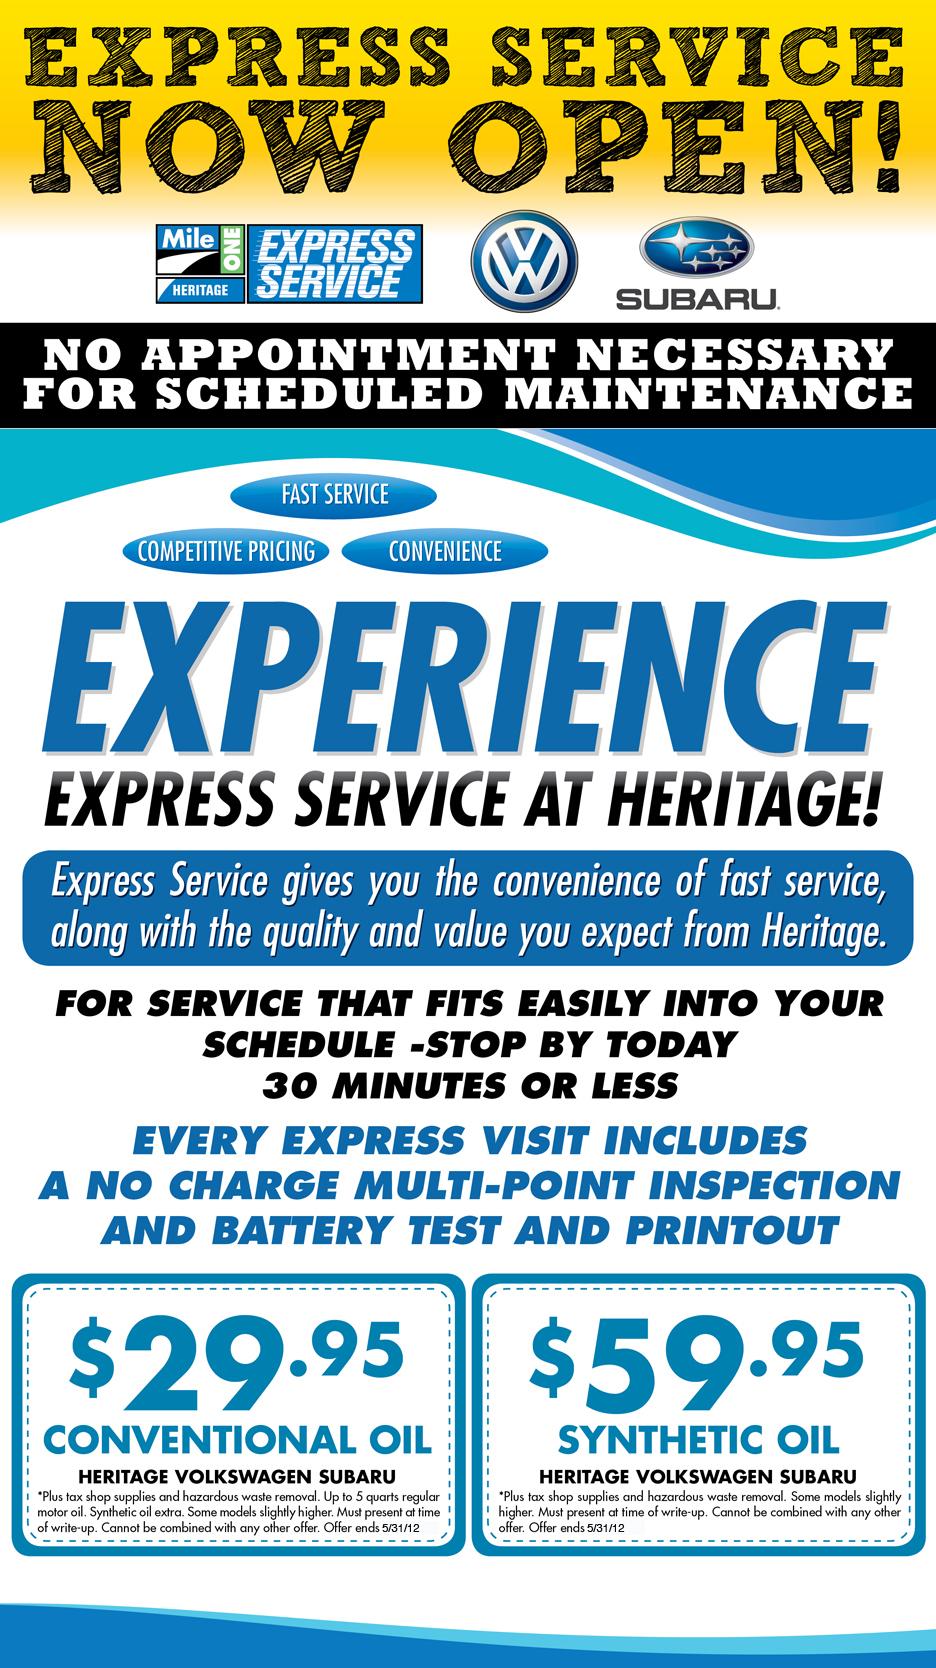 Jimmies Wrecker Service Jackson AAA Towing Auto Repair